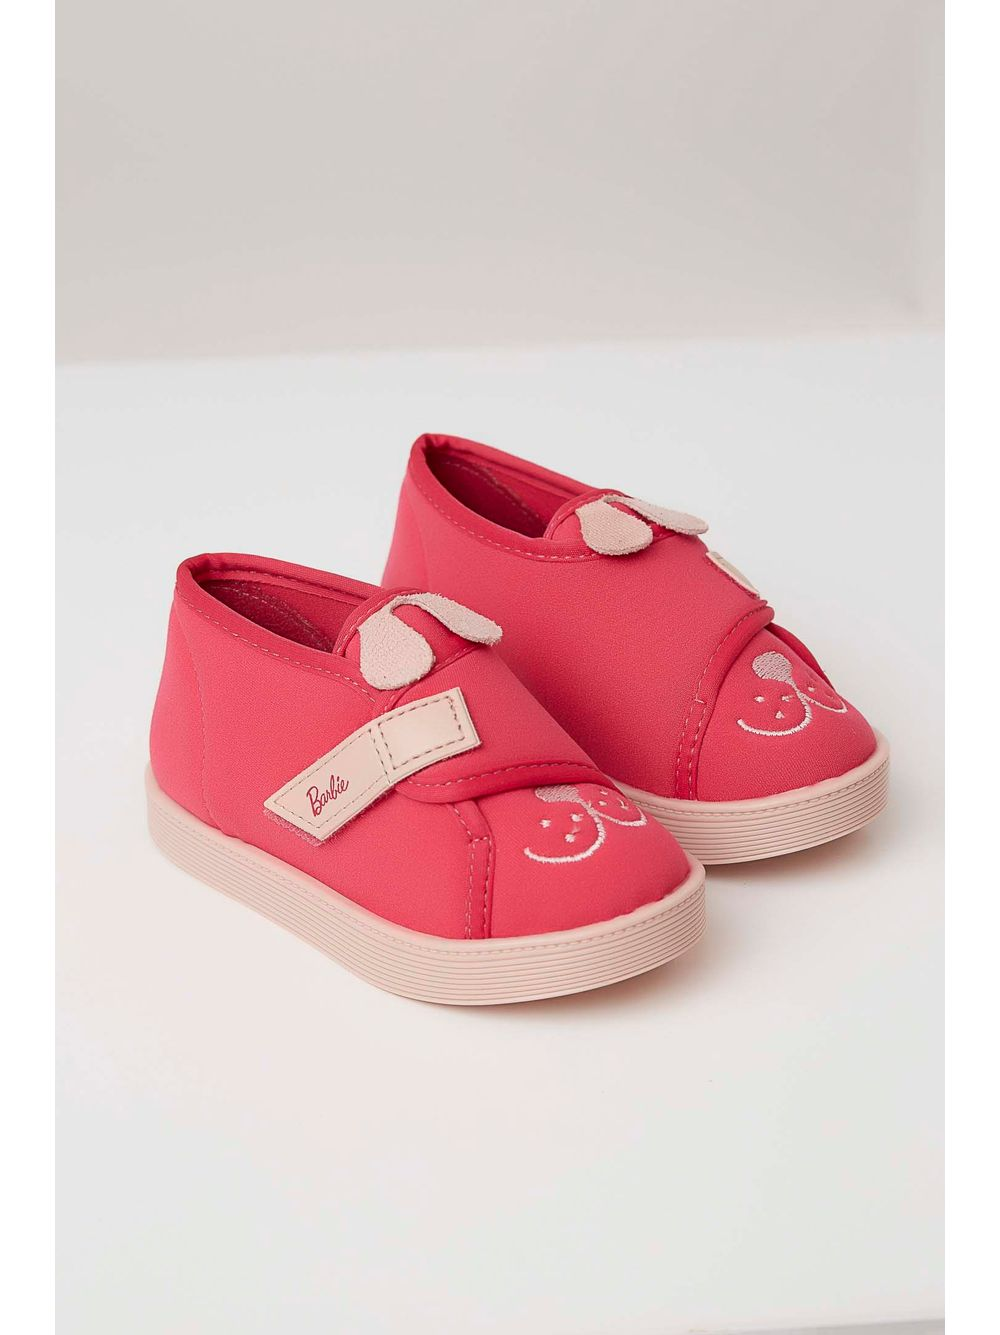 ead6a419ed Tênis Grendene Barbie Fashion Pets Infantil Menina Pink - pittol